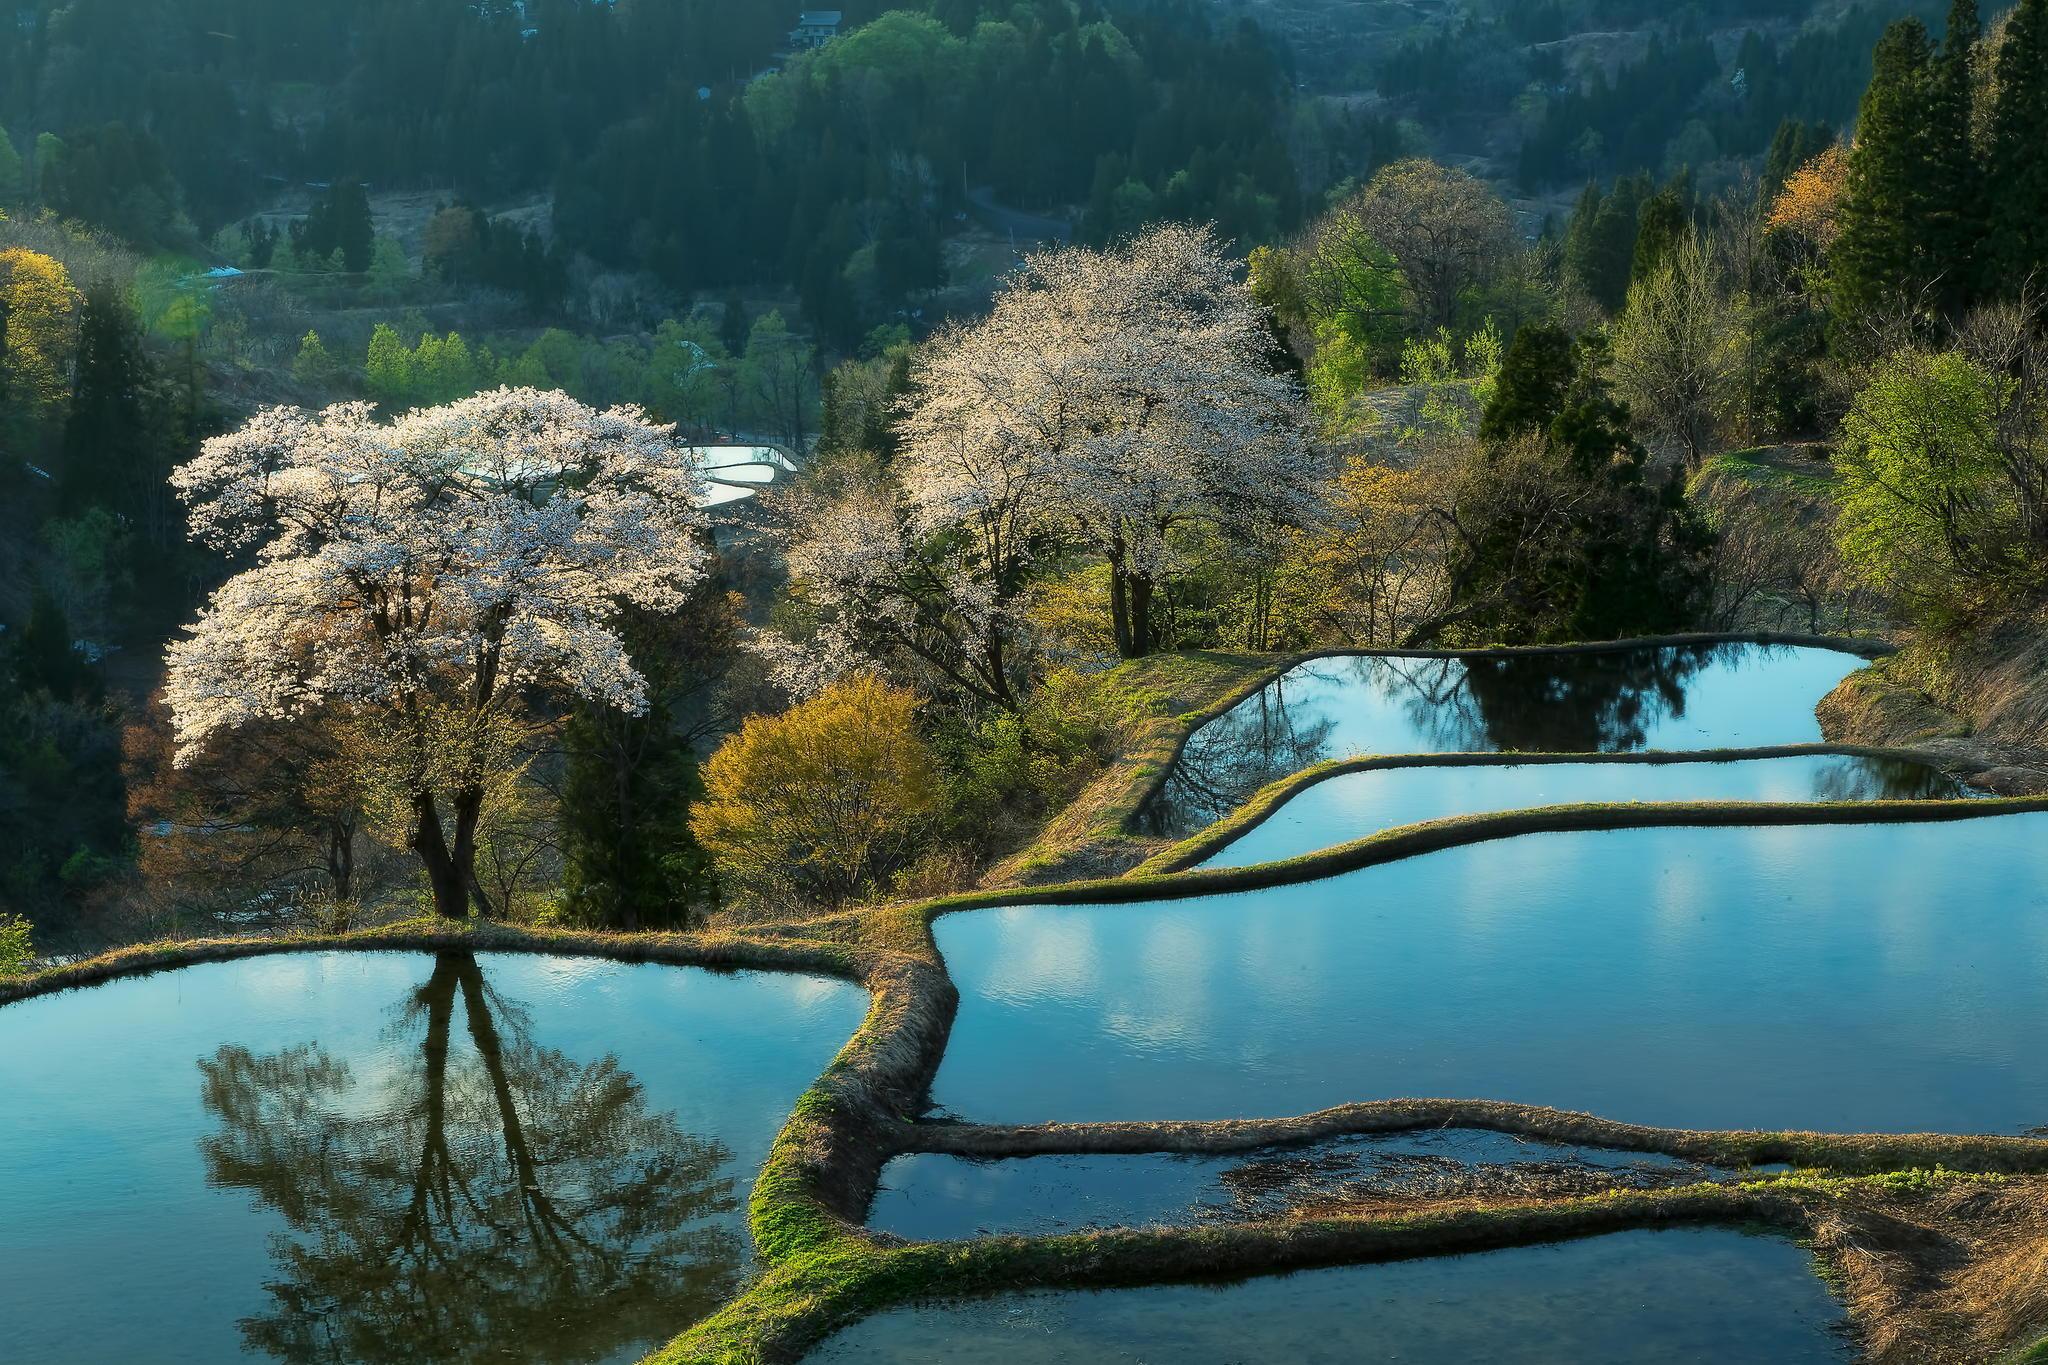 xinhua china anhui laian pond cypress scenery scenery - HD1920×1200